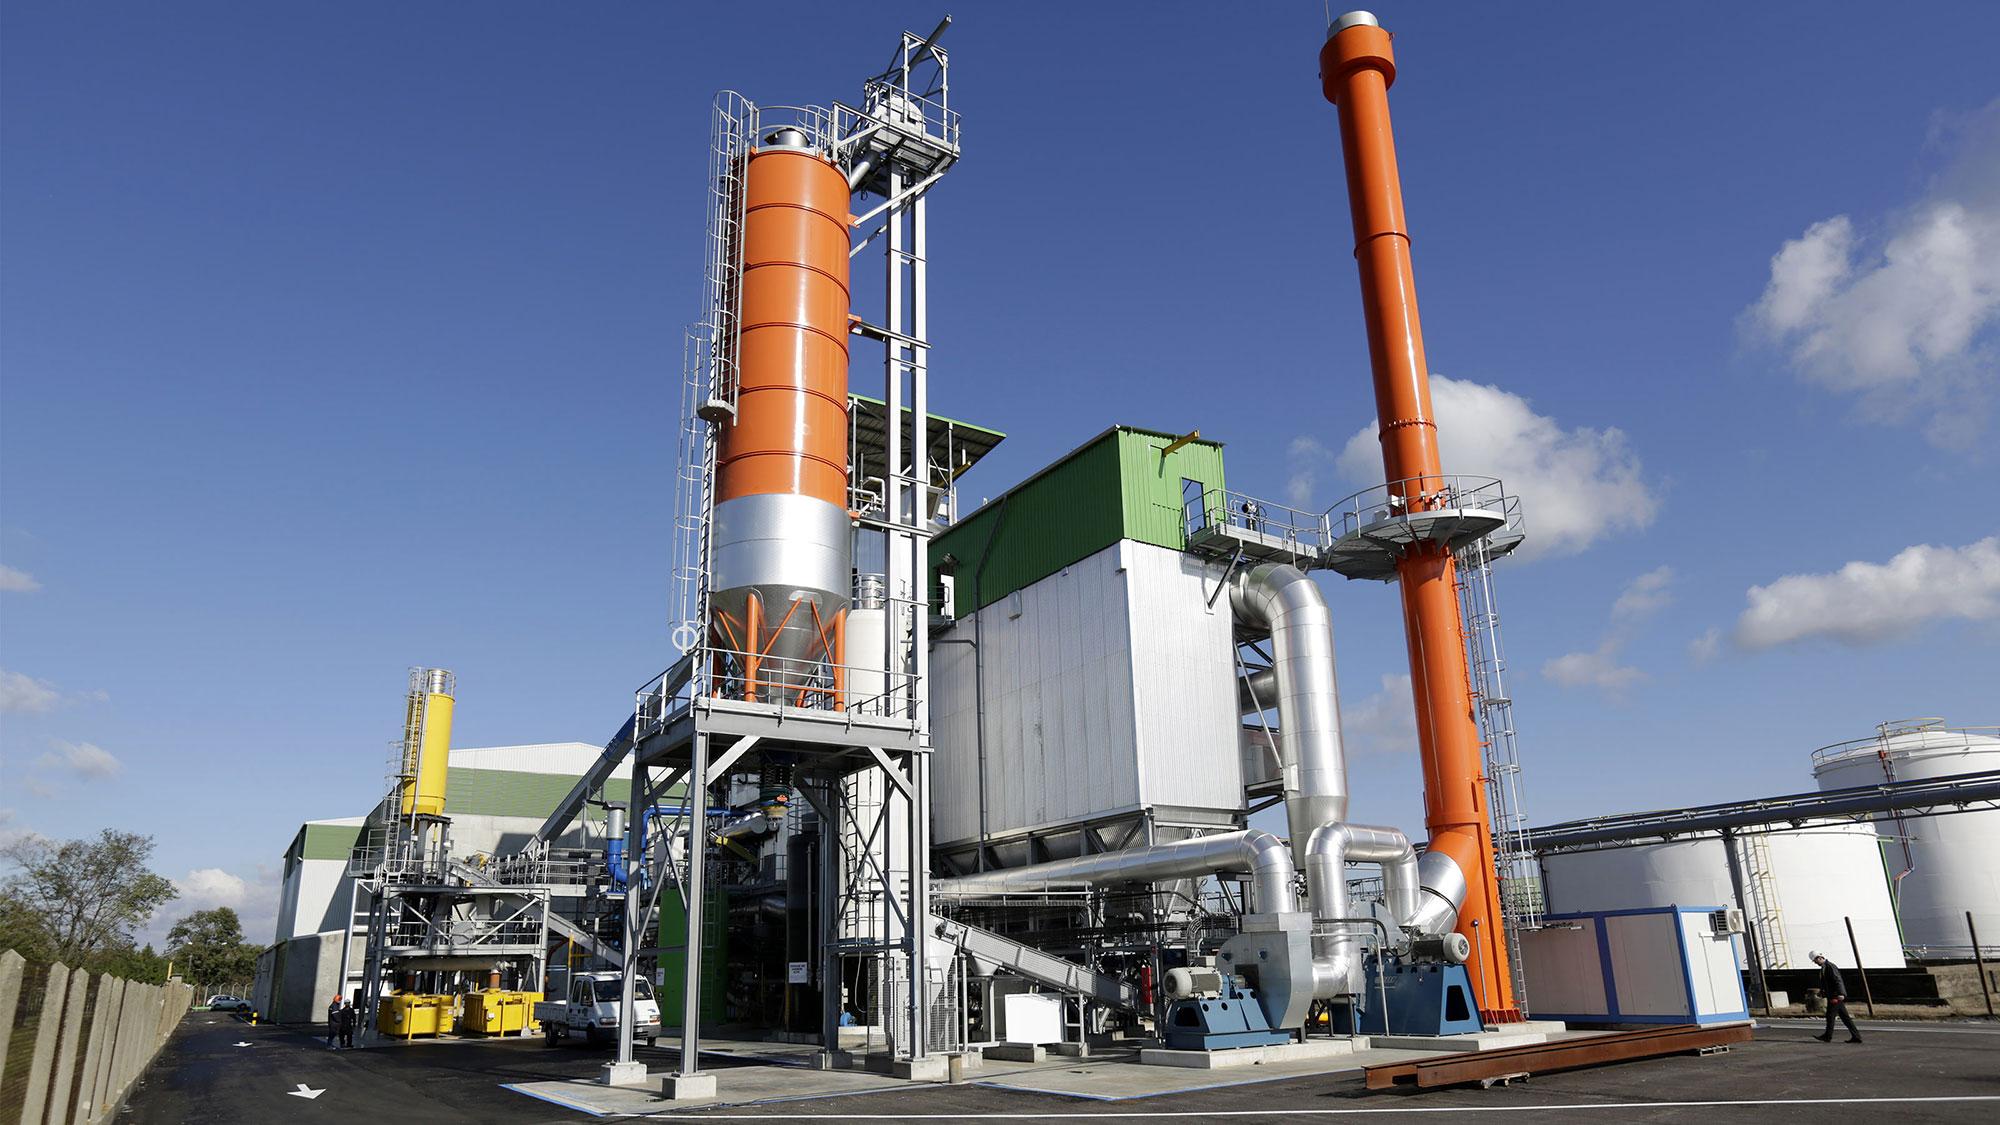 Robin roussillon化学平台能源的废物